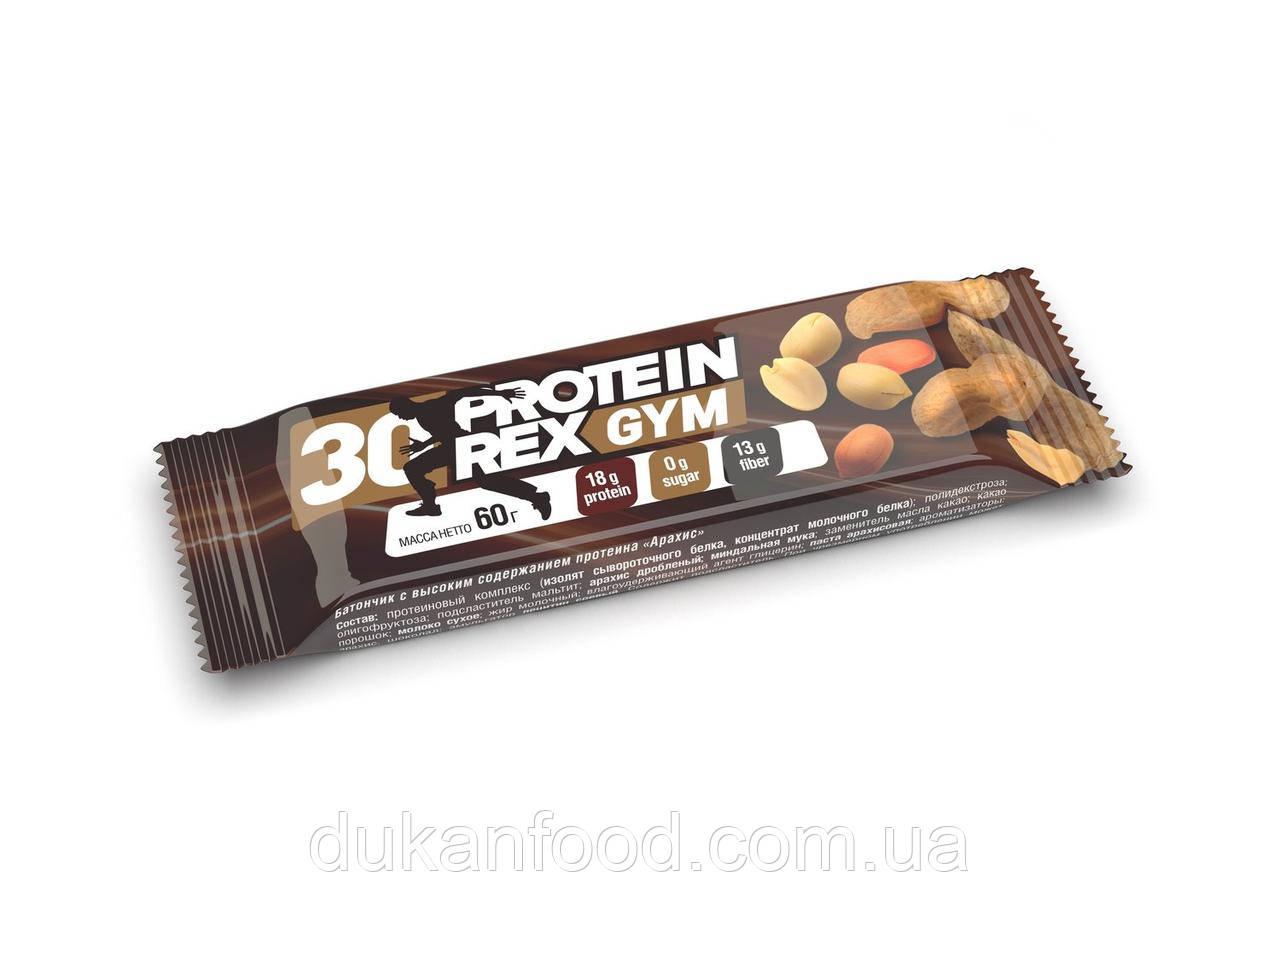 "Батончик протеиновый ProteinRex ""Арахис"", 30% протеина. СРОК ГОДНОСТИ ДО 15.04."